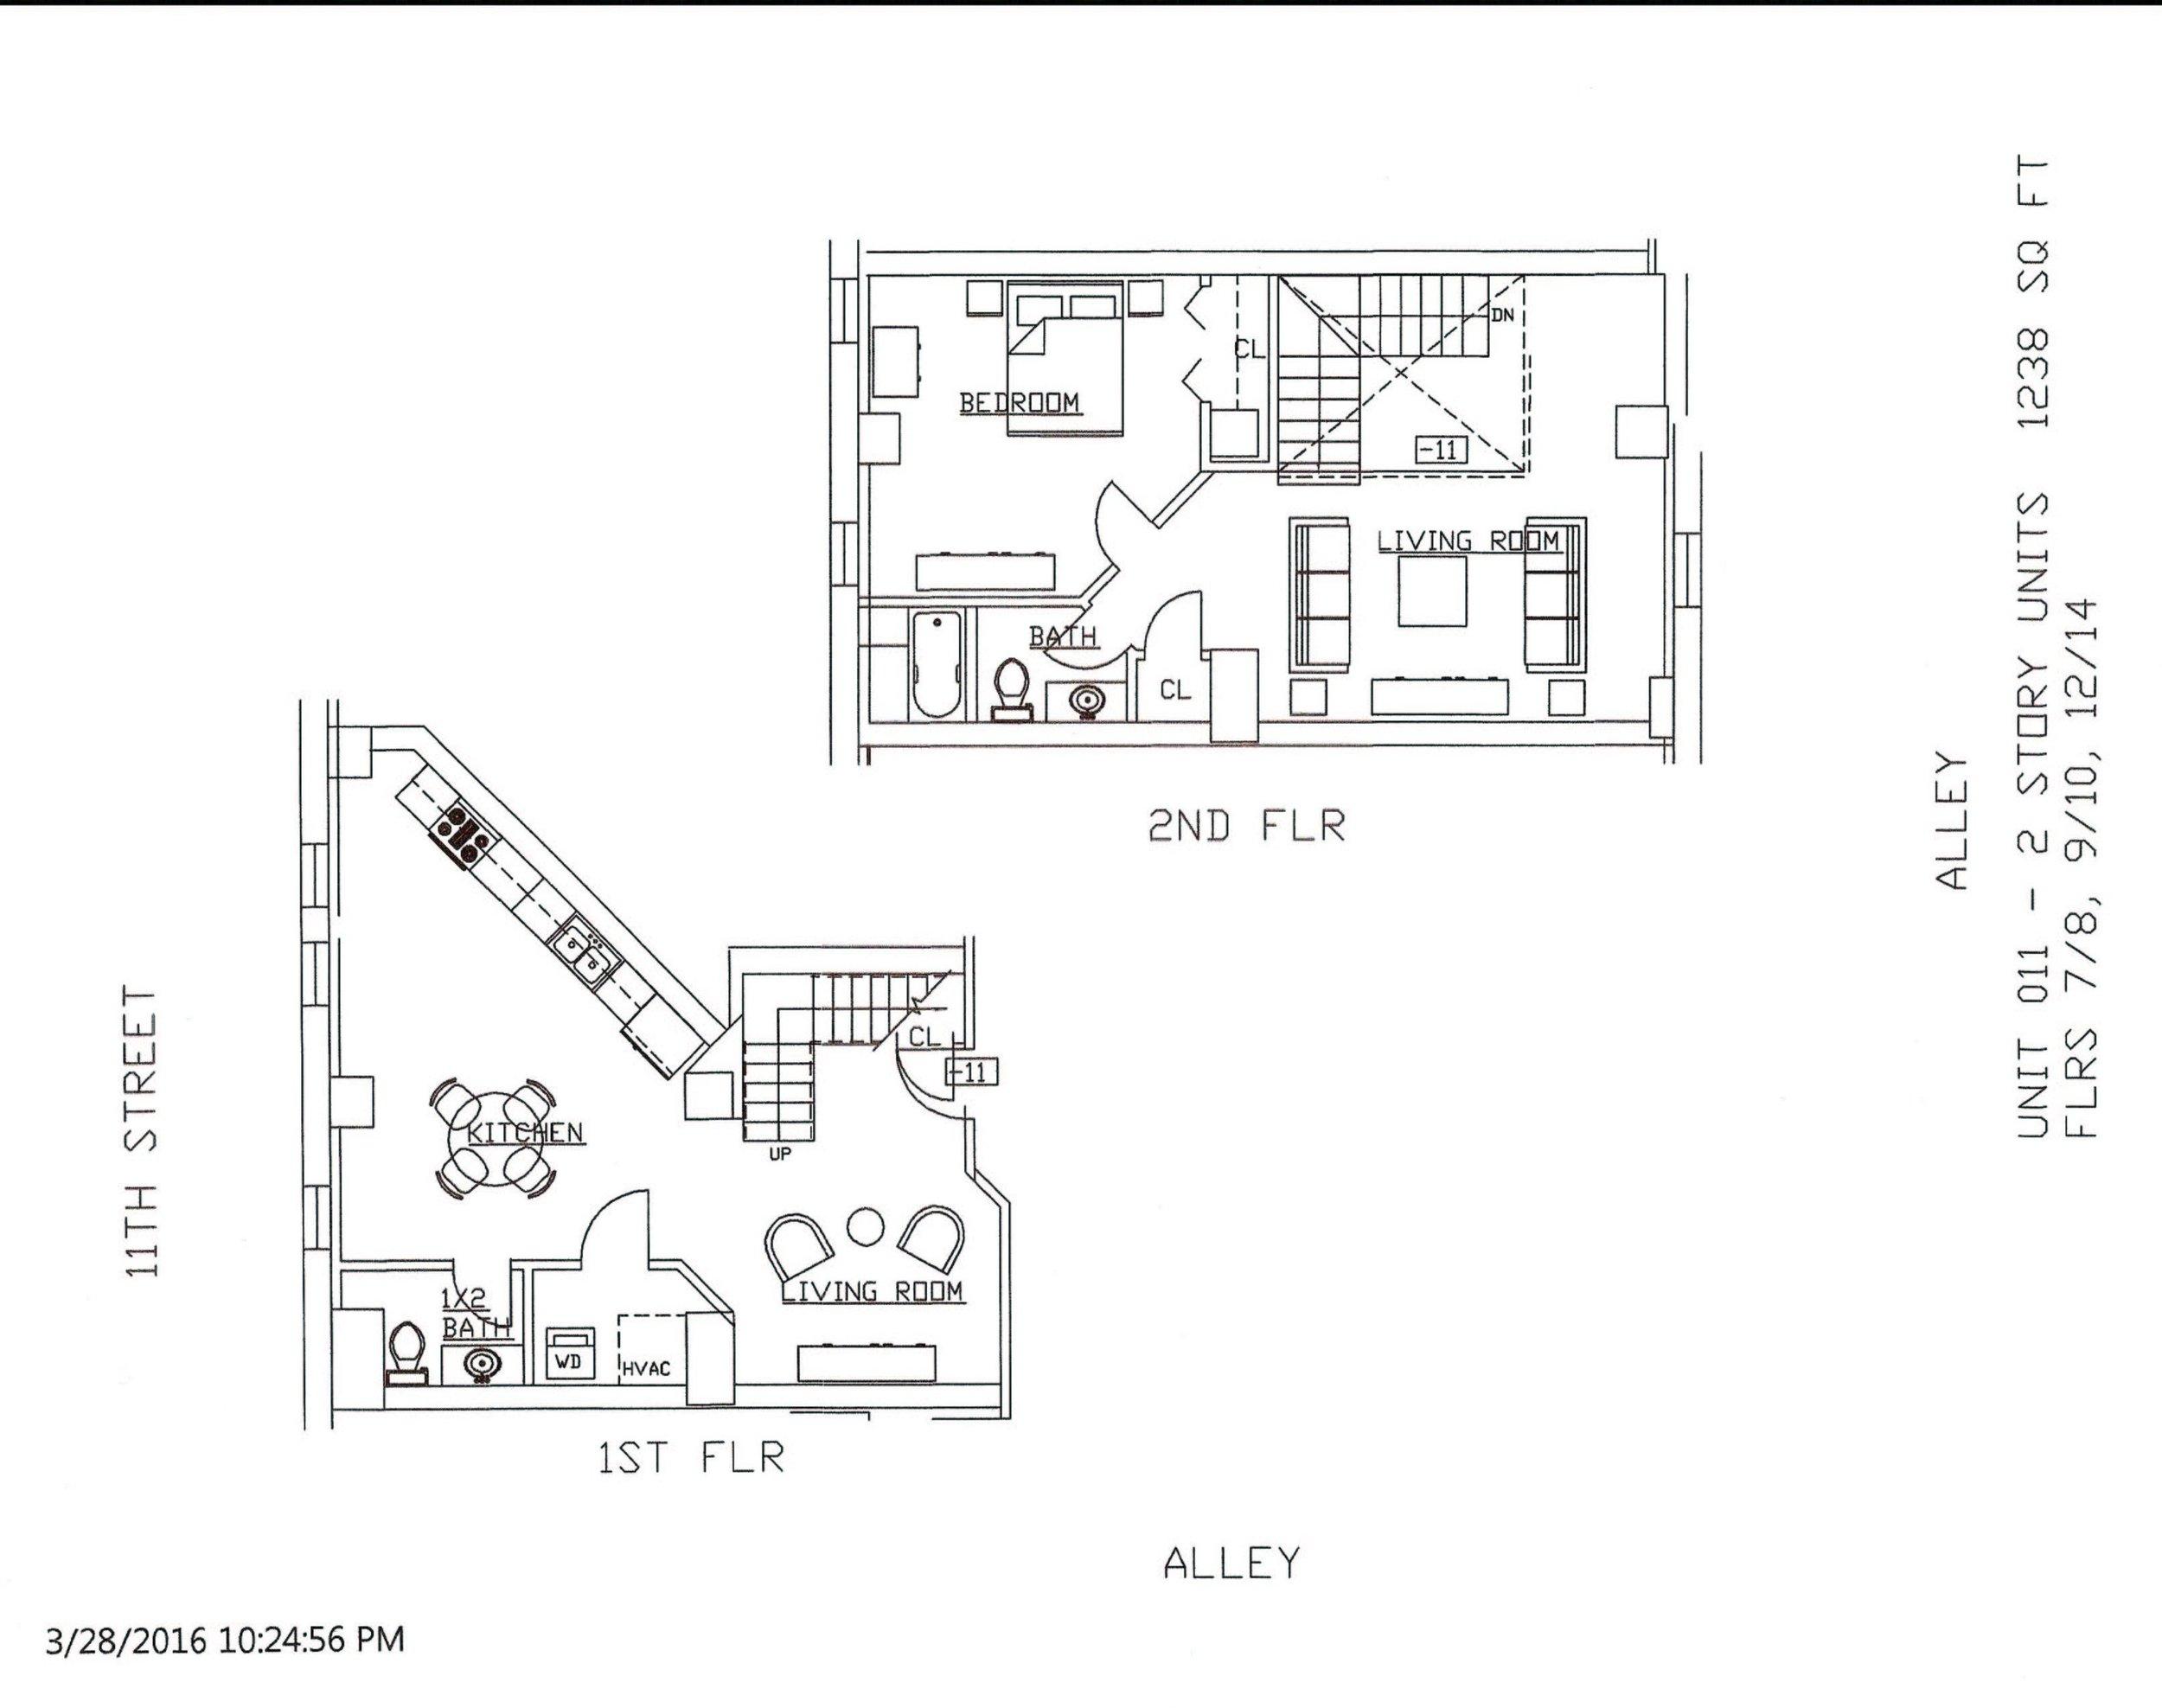 Unit 11, 1238 Square Feet